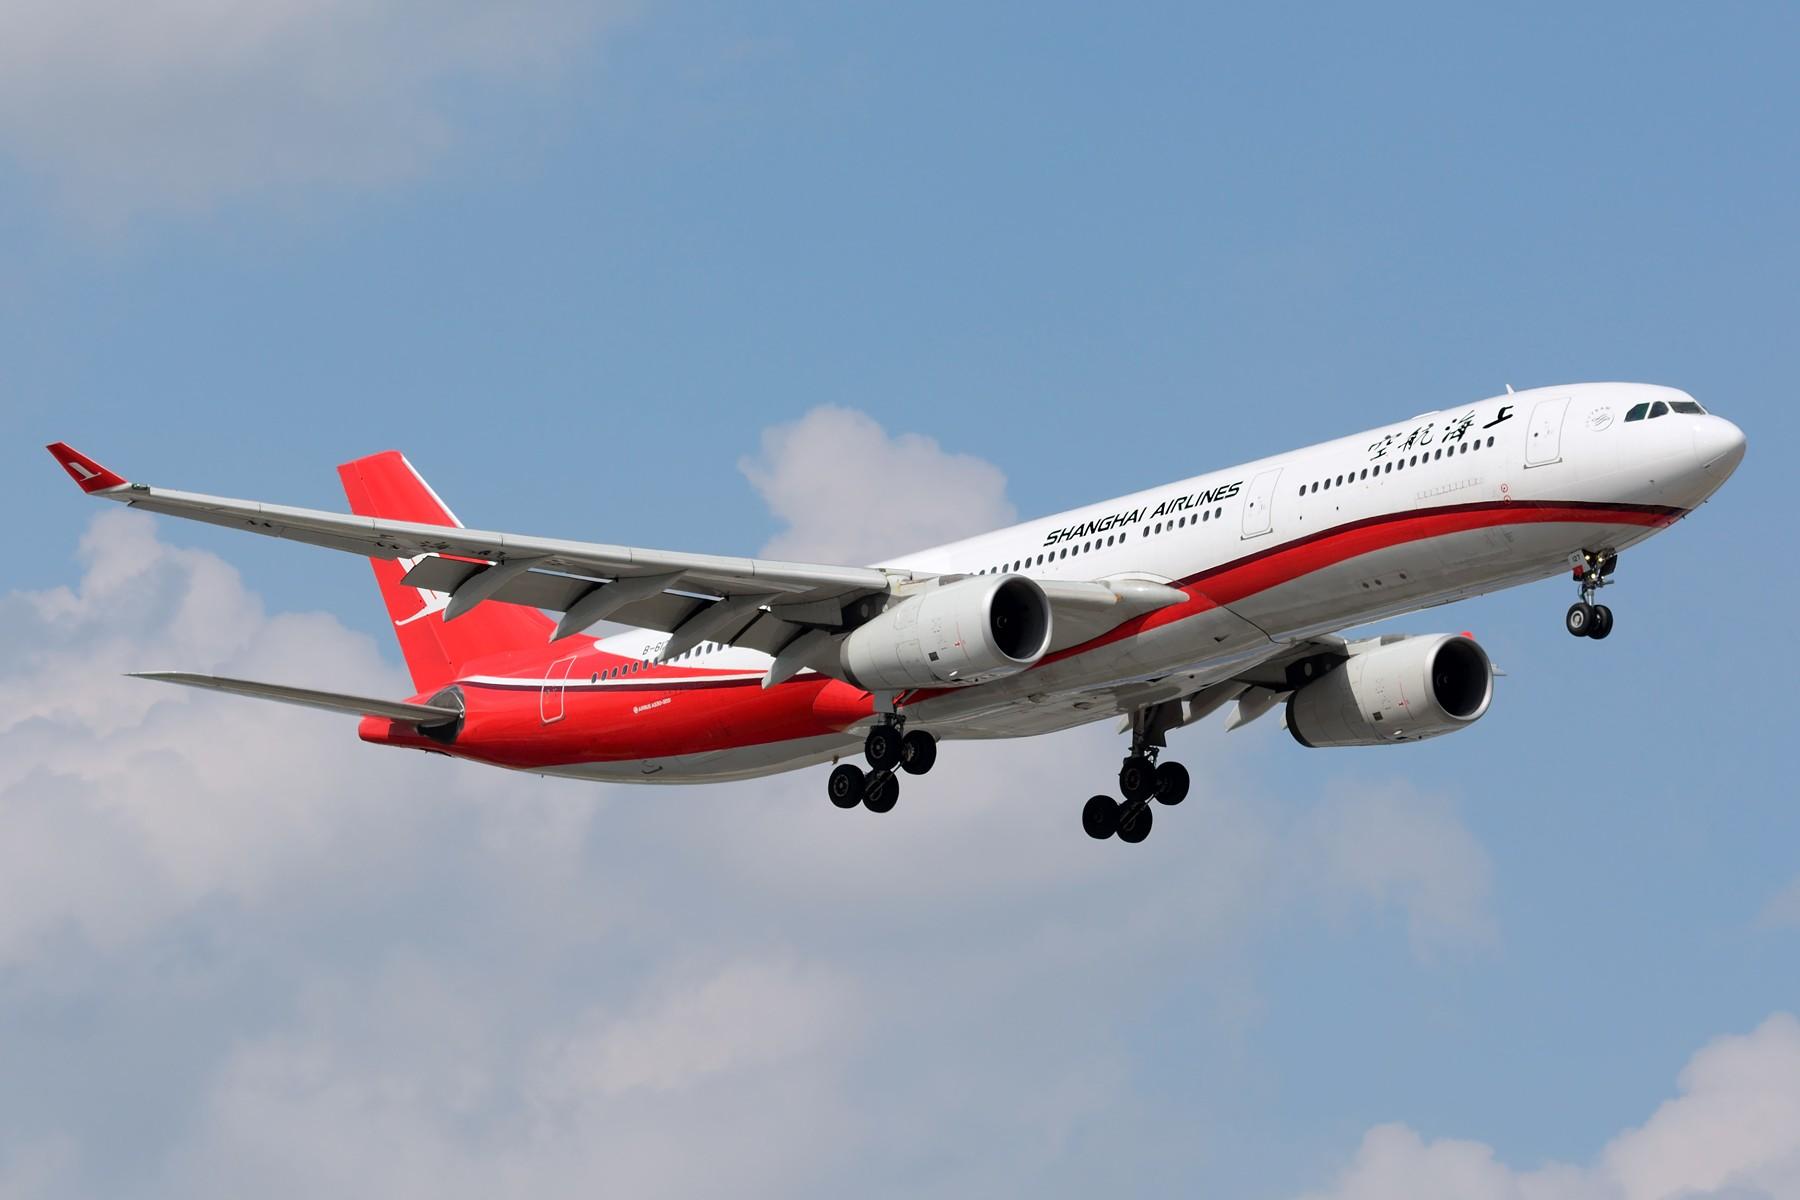 Re:[原创]【SHA】上海航空A330-300机队 B-6096 B-6097 B-6127 AIRBUS A330-300 B-6127 中国上海虹桥国际机场